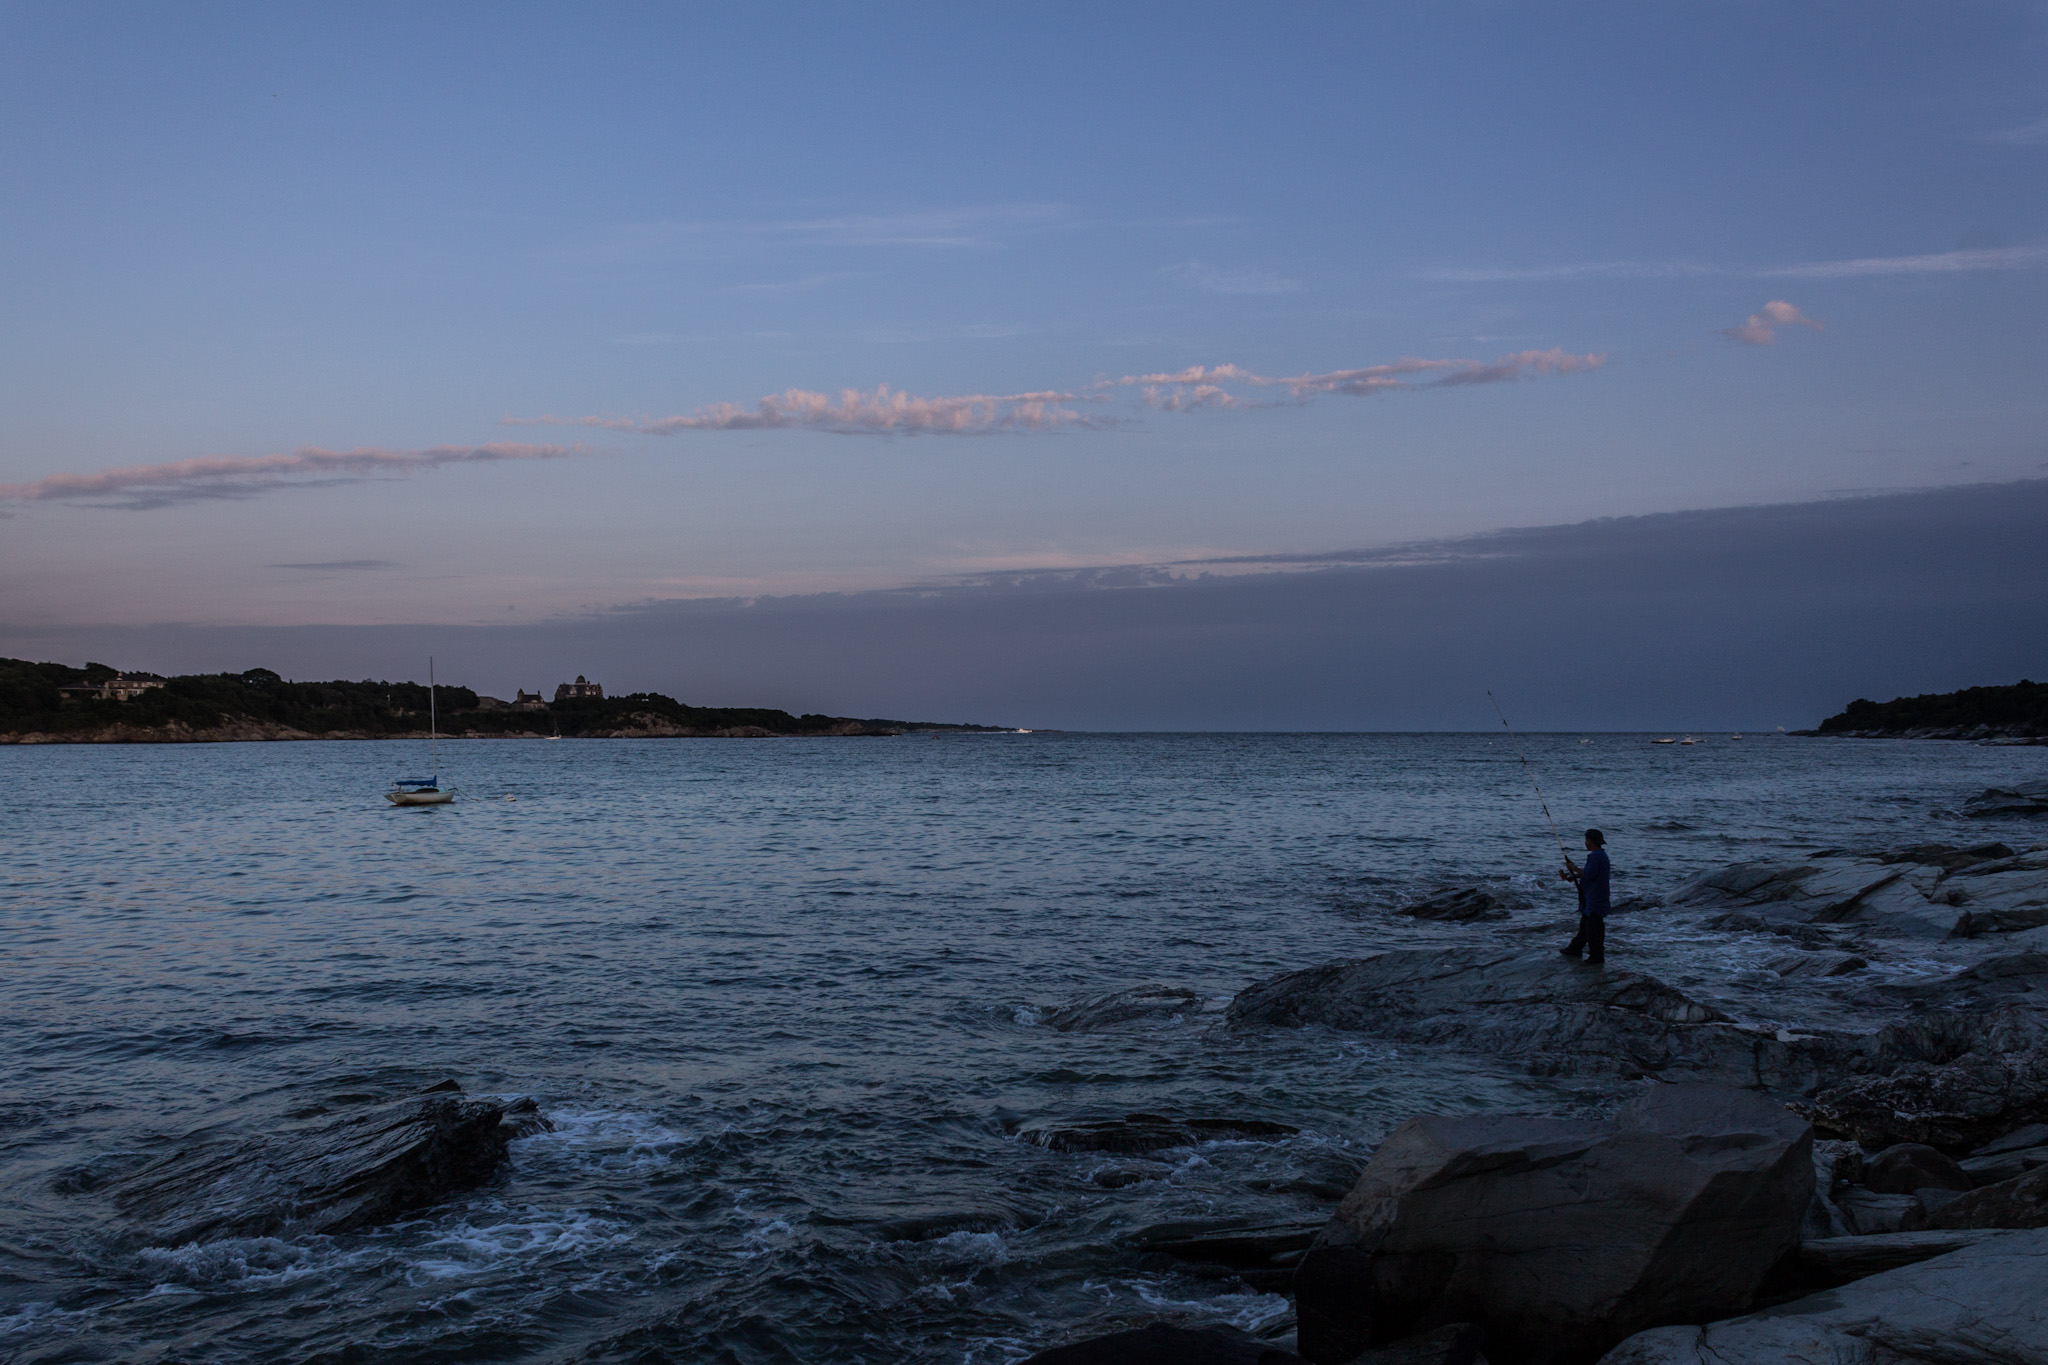 Mackerel Cove